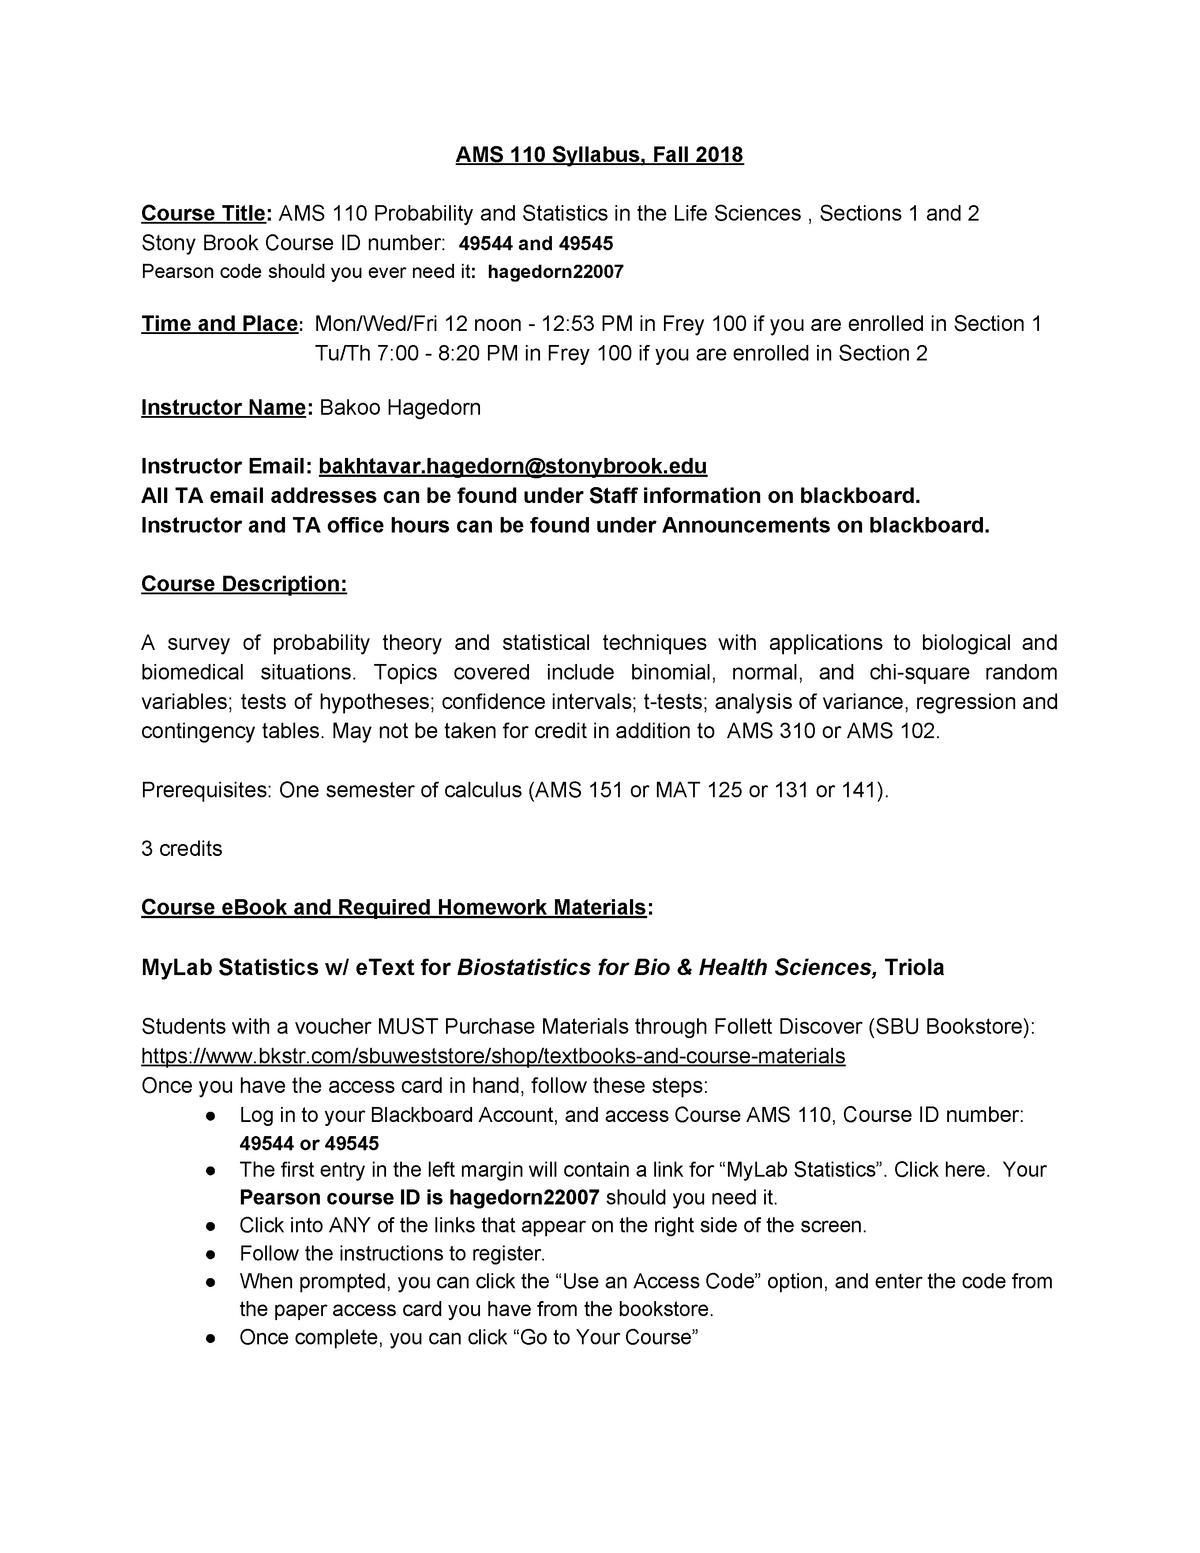 AMS 110 Spring 2019 Syllabus - AMS 572: Applied Statistics